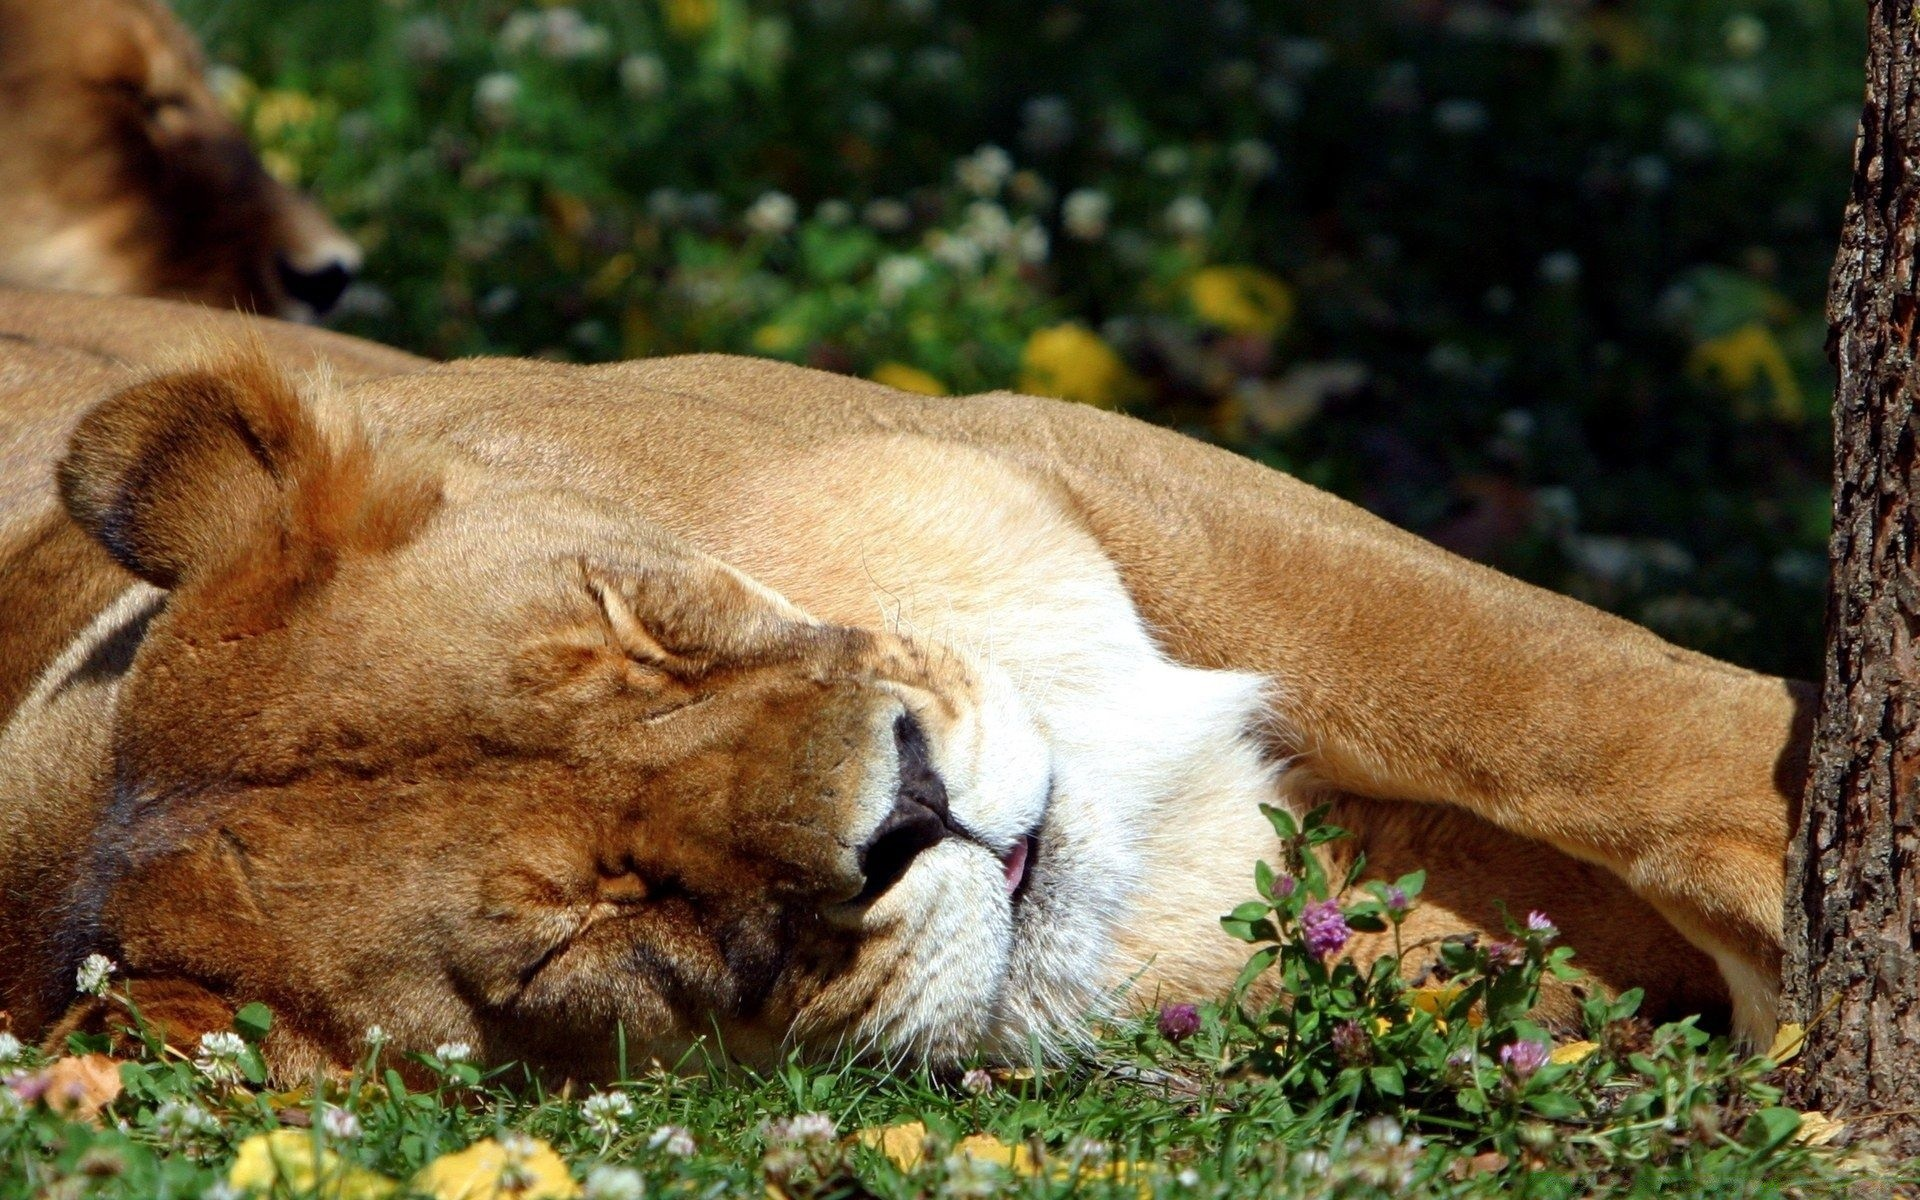 sleepy animals pictures - HD1920×1200